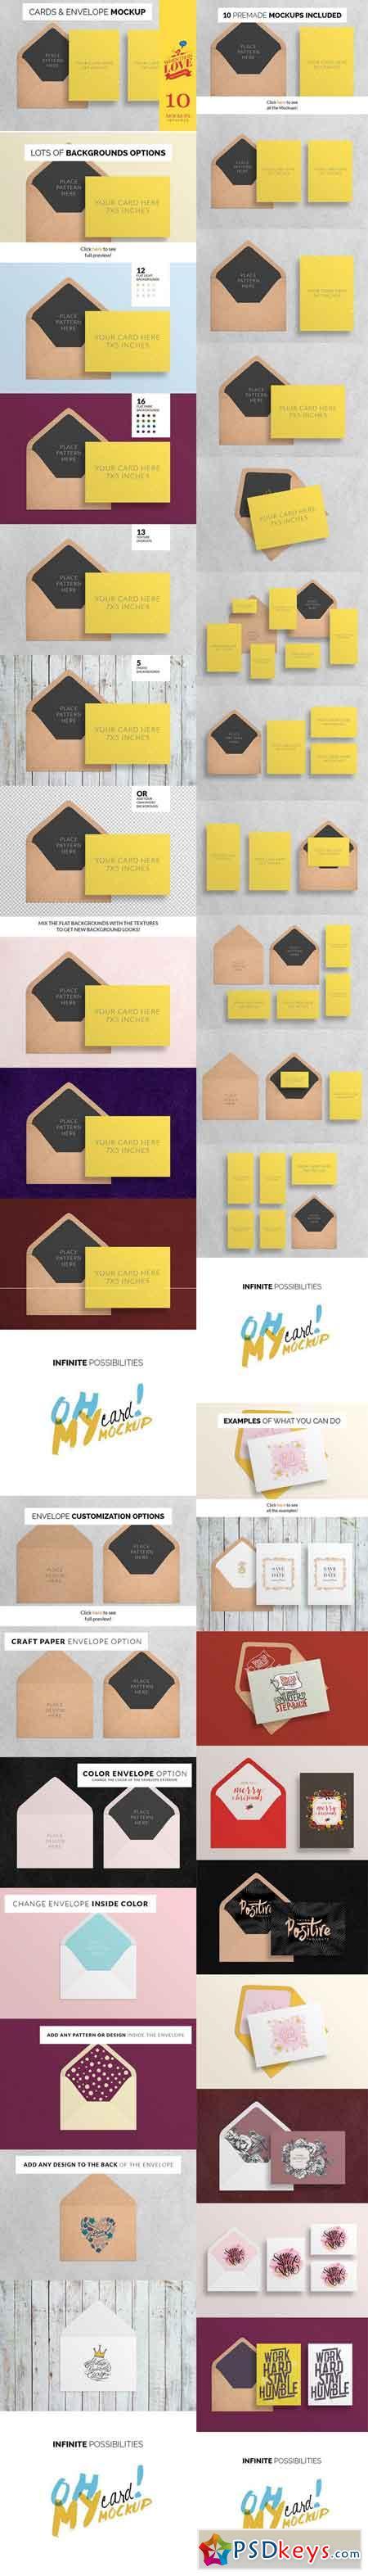 OhMyCard Mockup - Cards & Envelope 420047